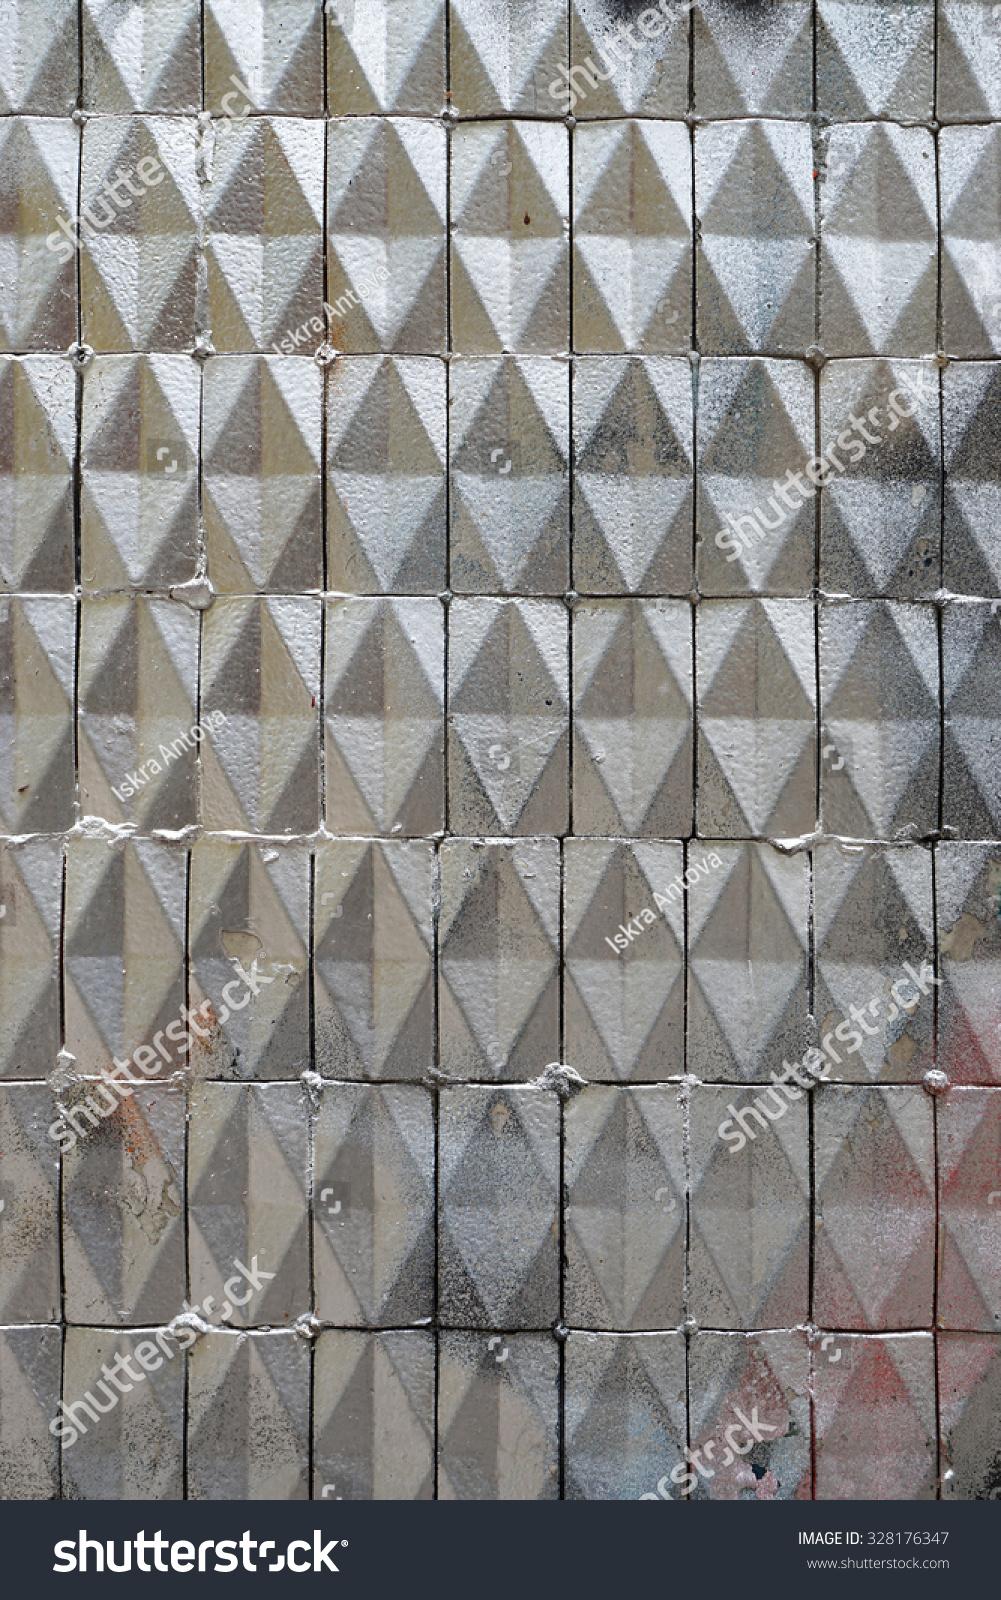 Dirty Old Facade Ceramic Triangular Tiles Stock Photo Edit Now